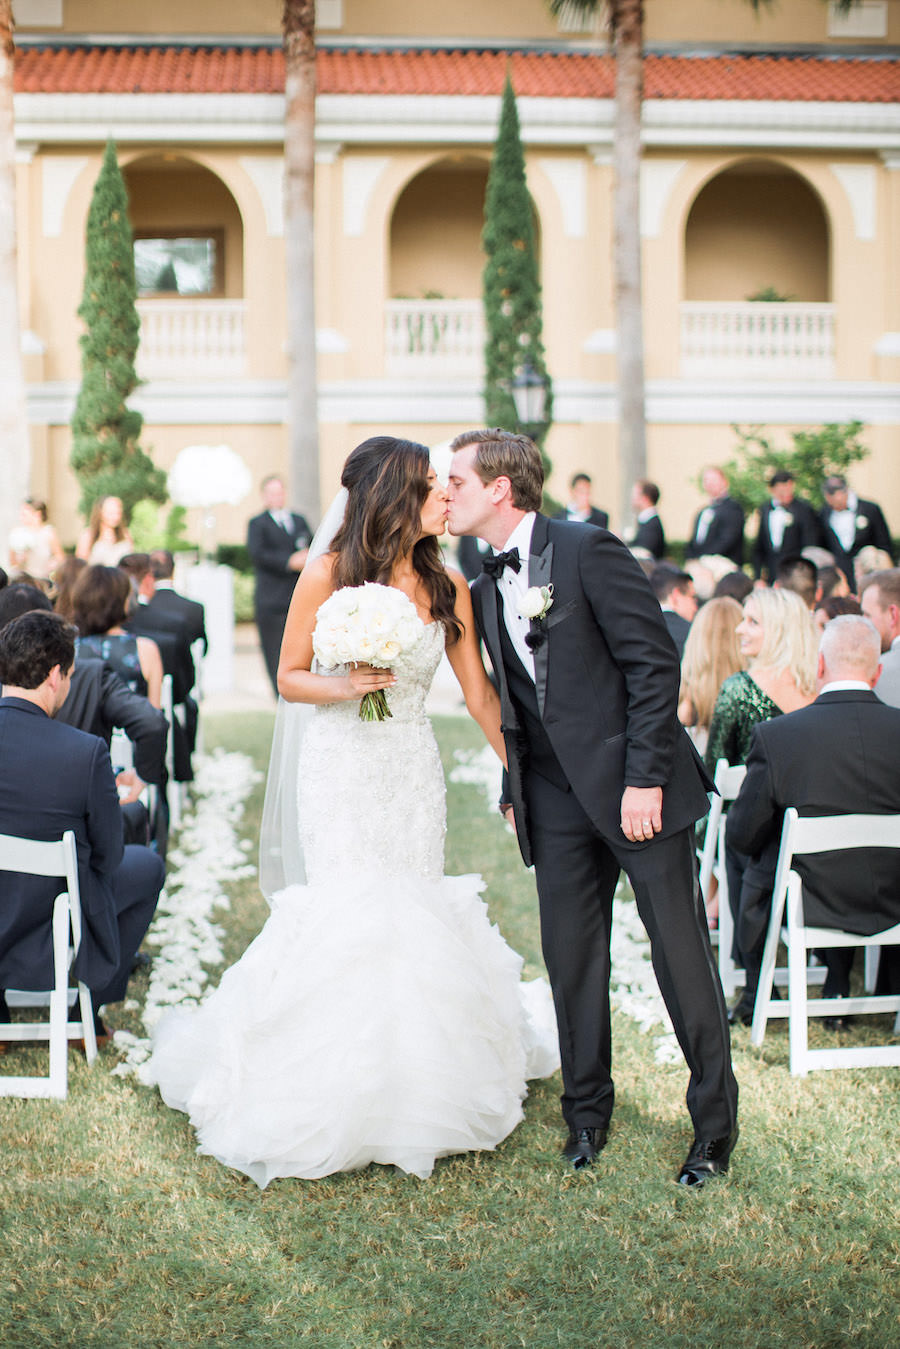 Elegant, Outdoor Wedding Ceremony Bride and Groom Portrait in Sarasota FL